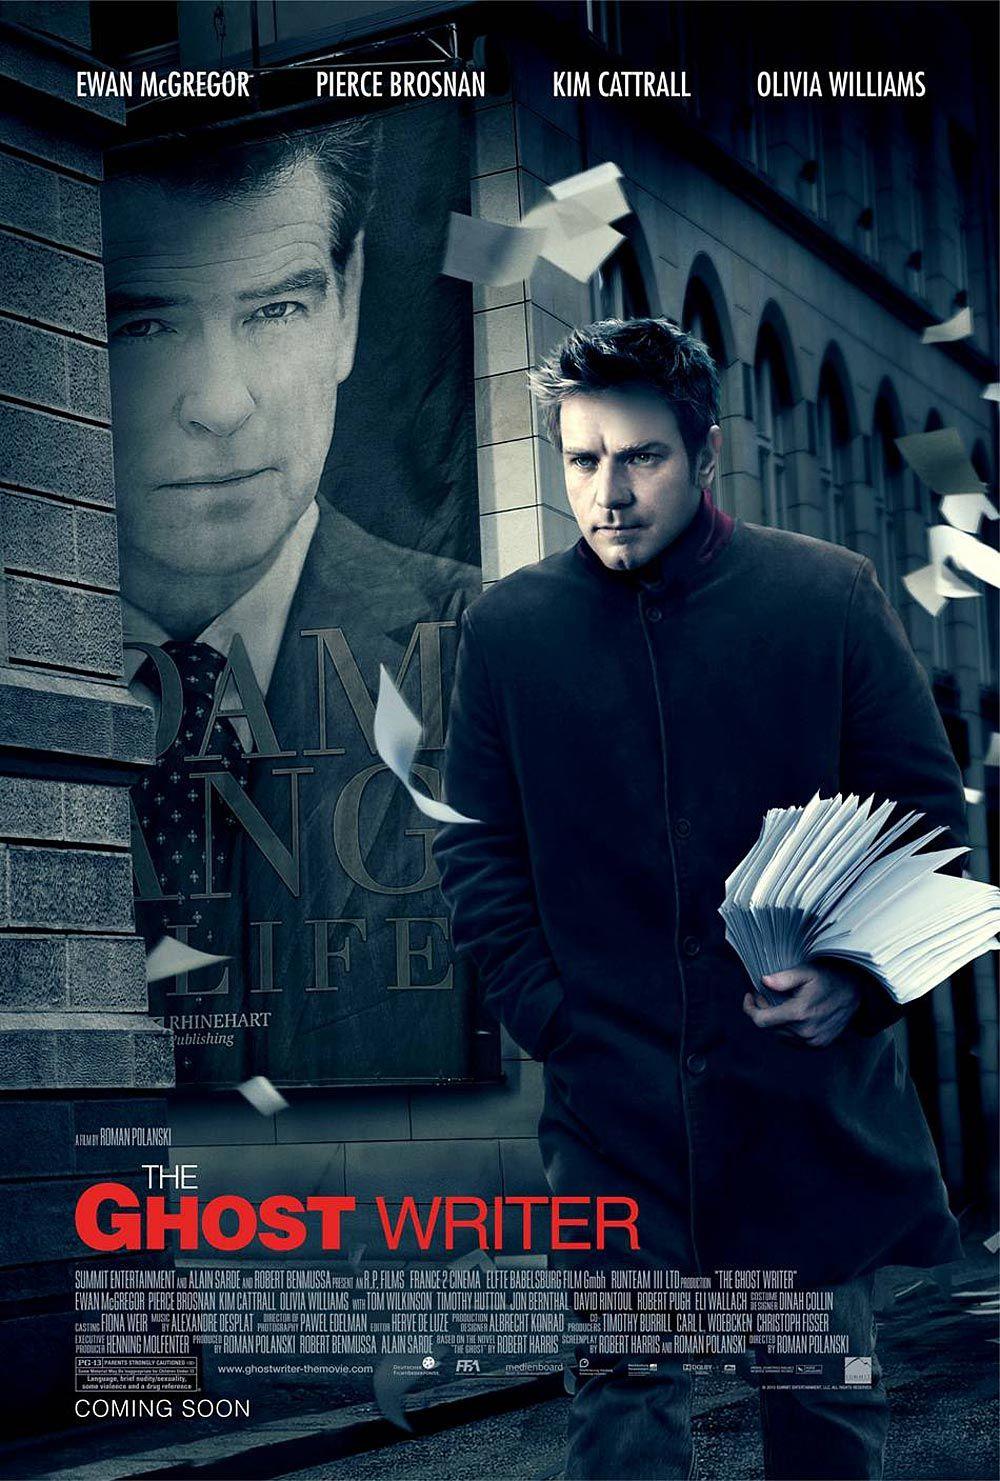 The Ghost Writer by Roman Polanski